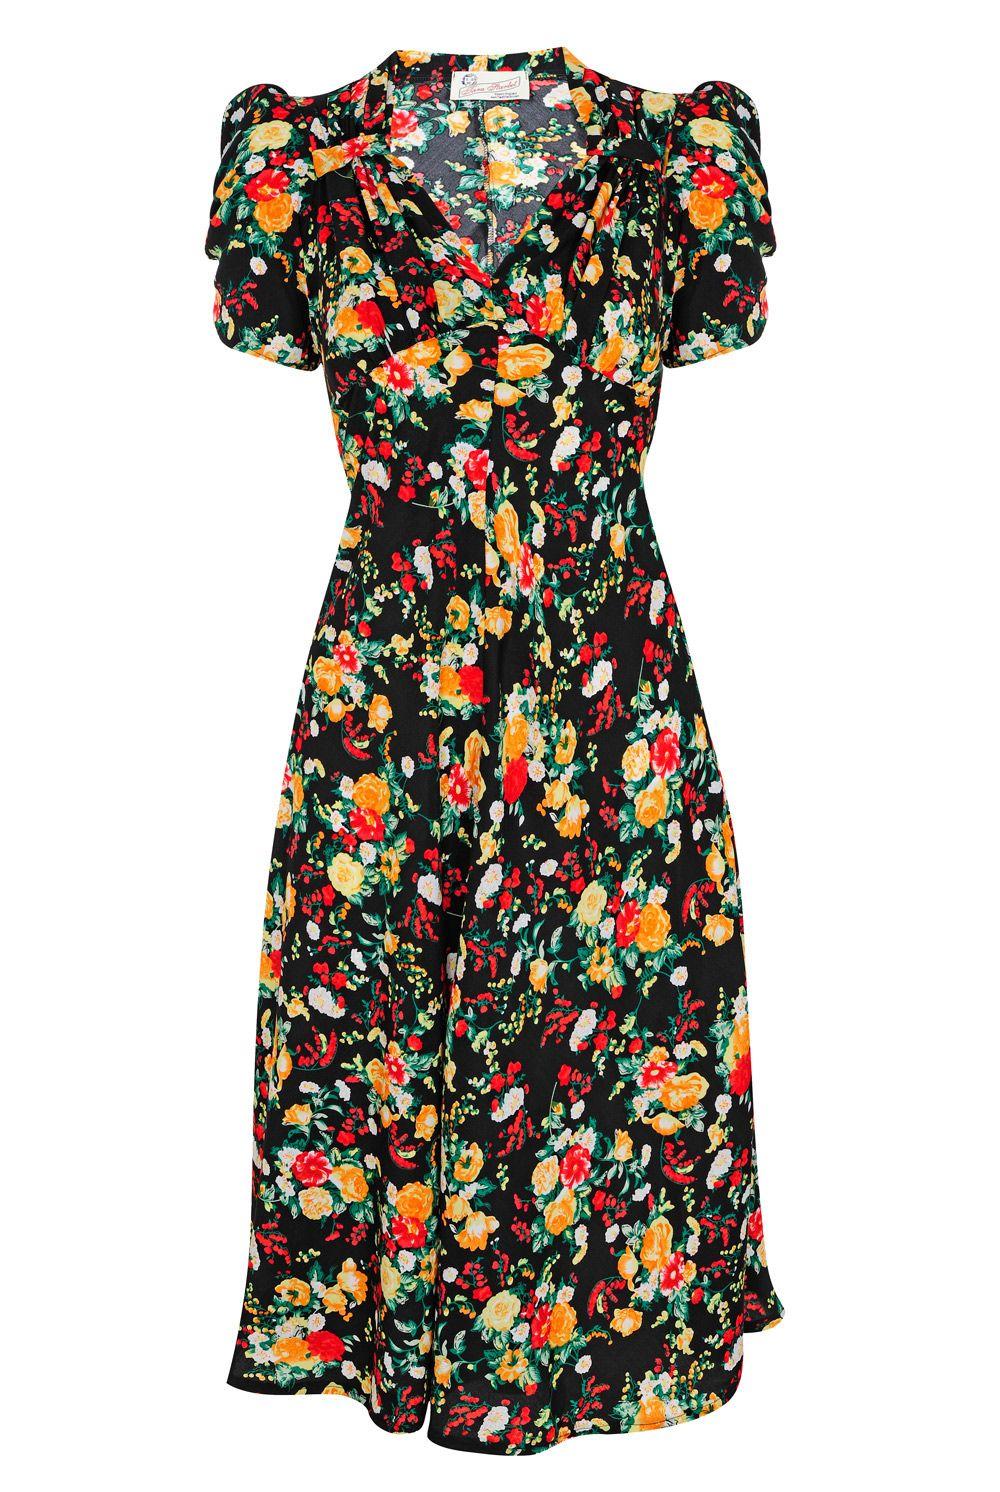 Tara Starlet 1940s 40s Style: The Perfect Classic Forties Tea-dress: Tara Starlet's